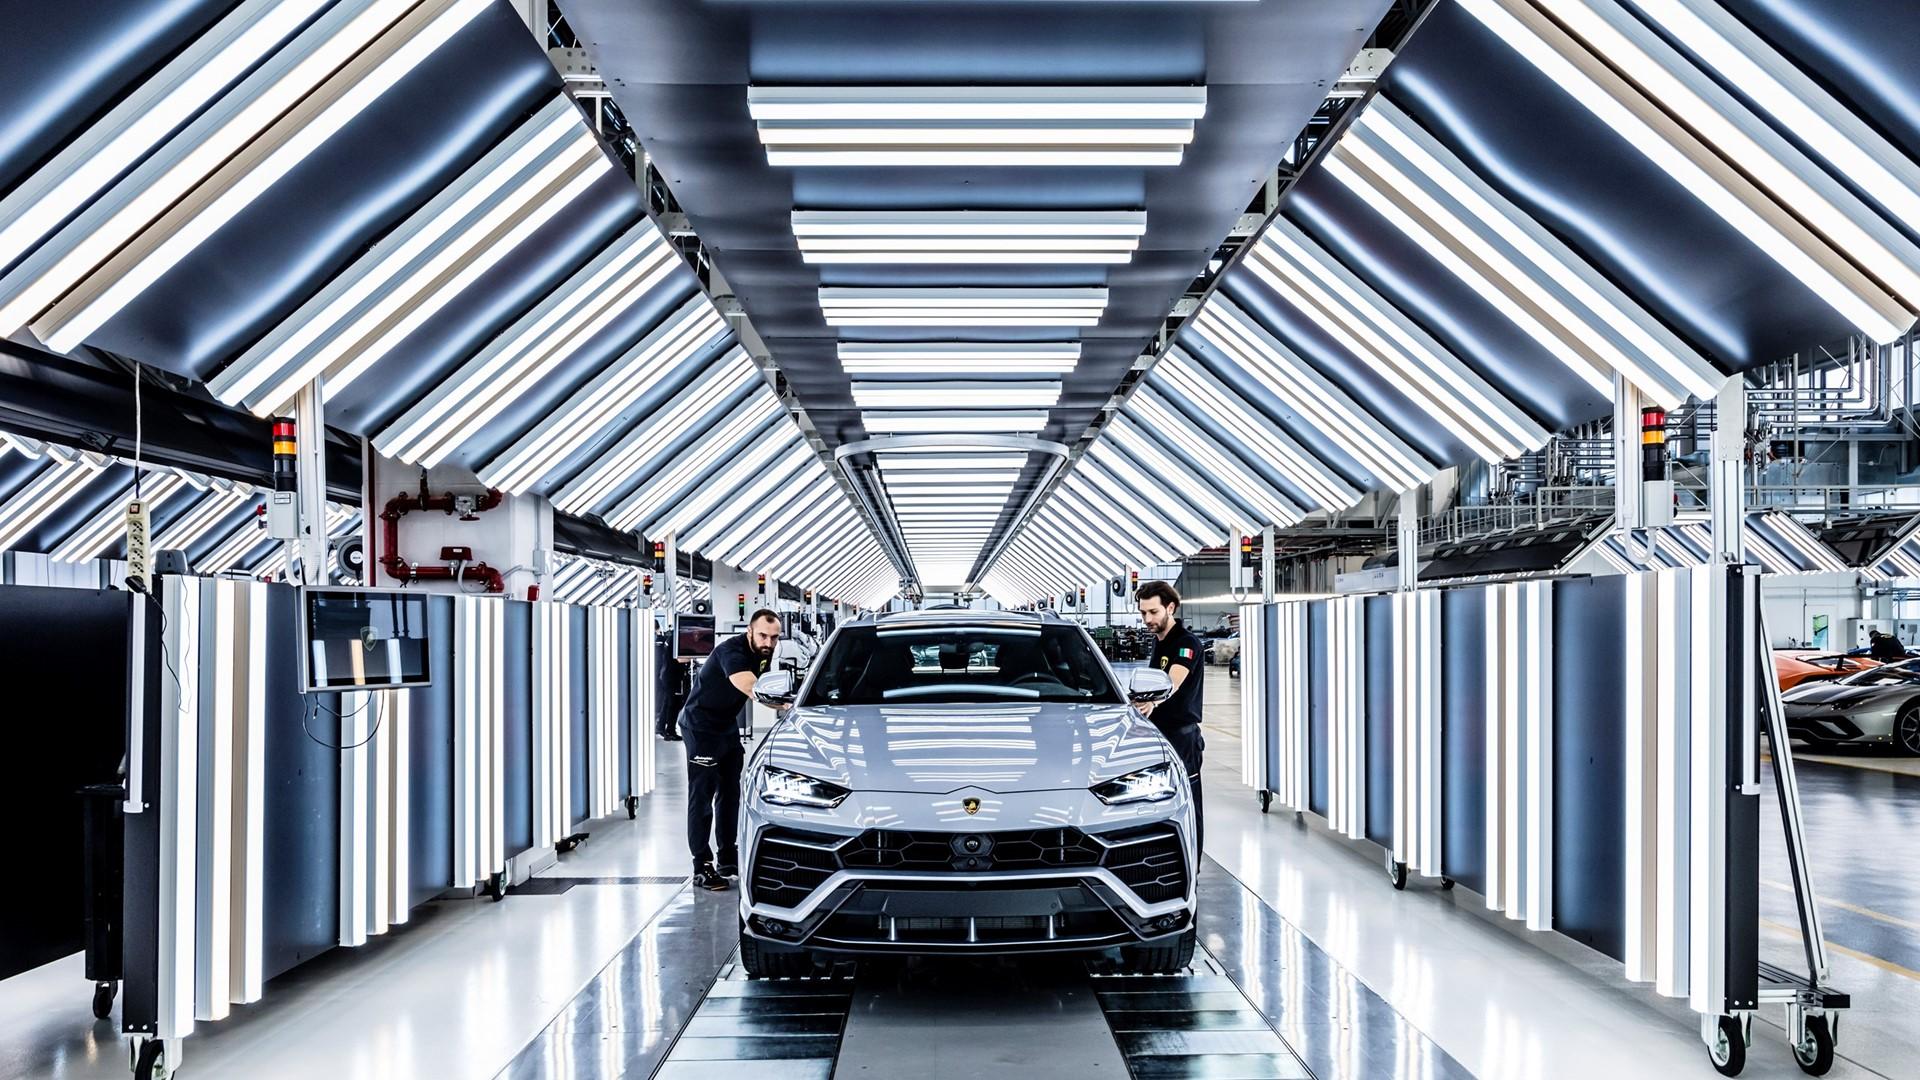 New production record: Automobili Lamborghini celebrates the 10,000th Urus - Image 1